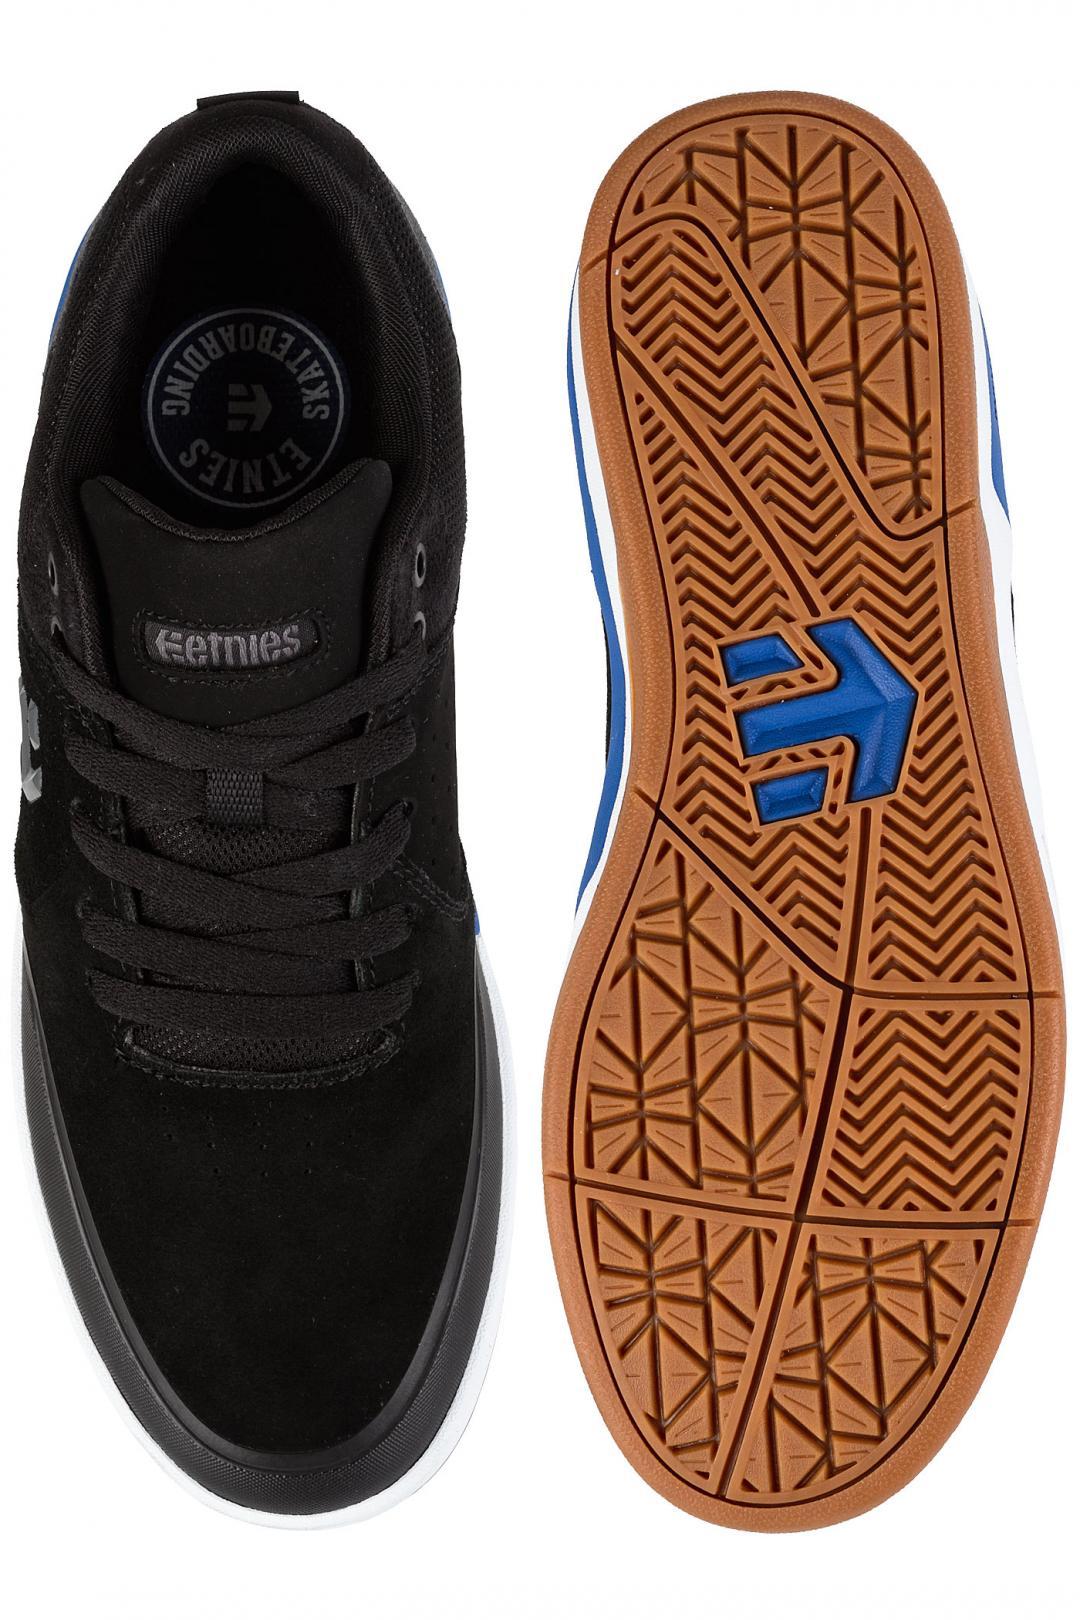 Uomo Etnies Marana XT black dark grey royal | Sneaker